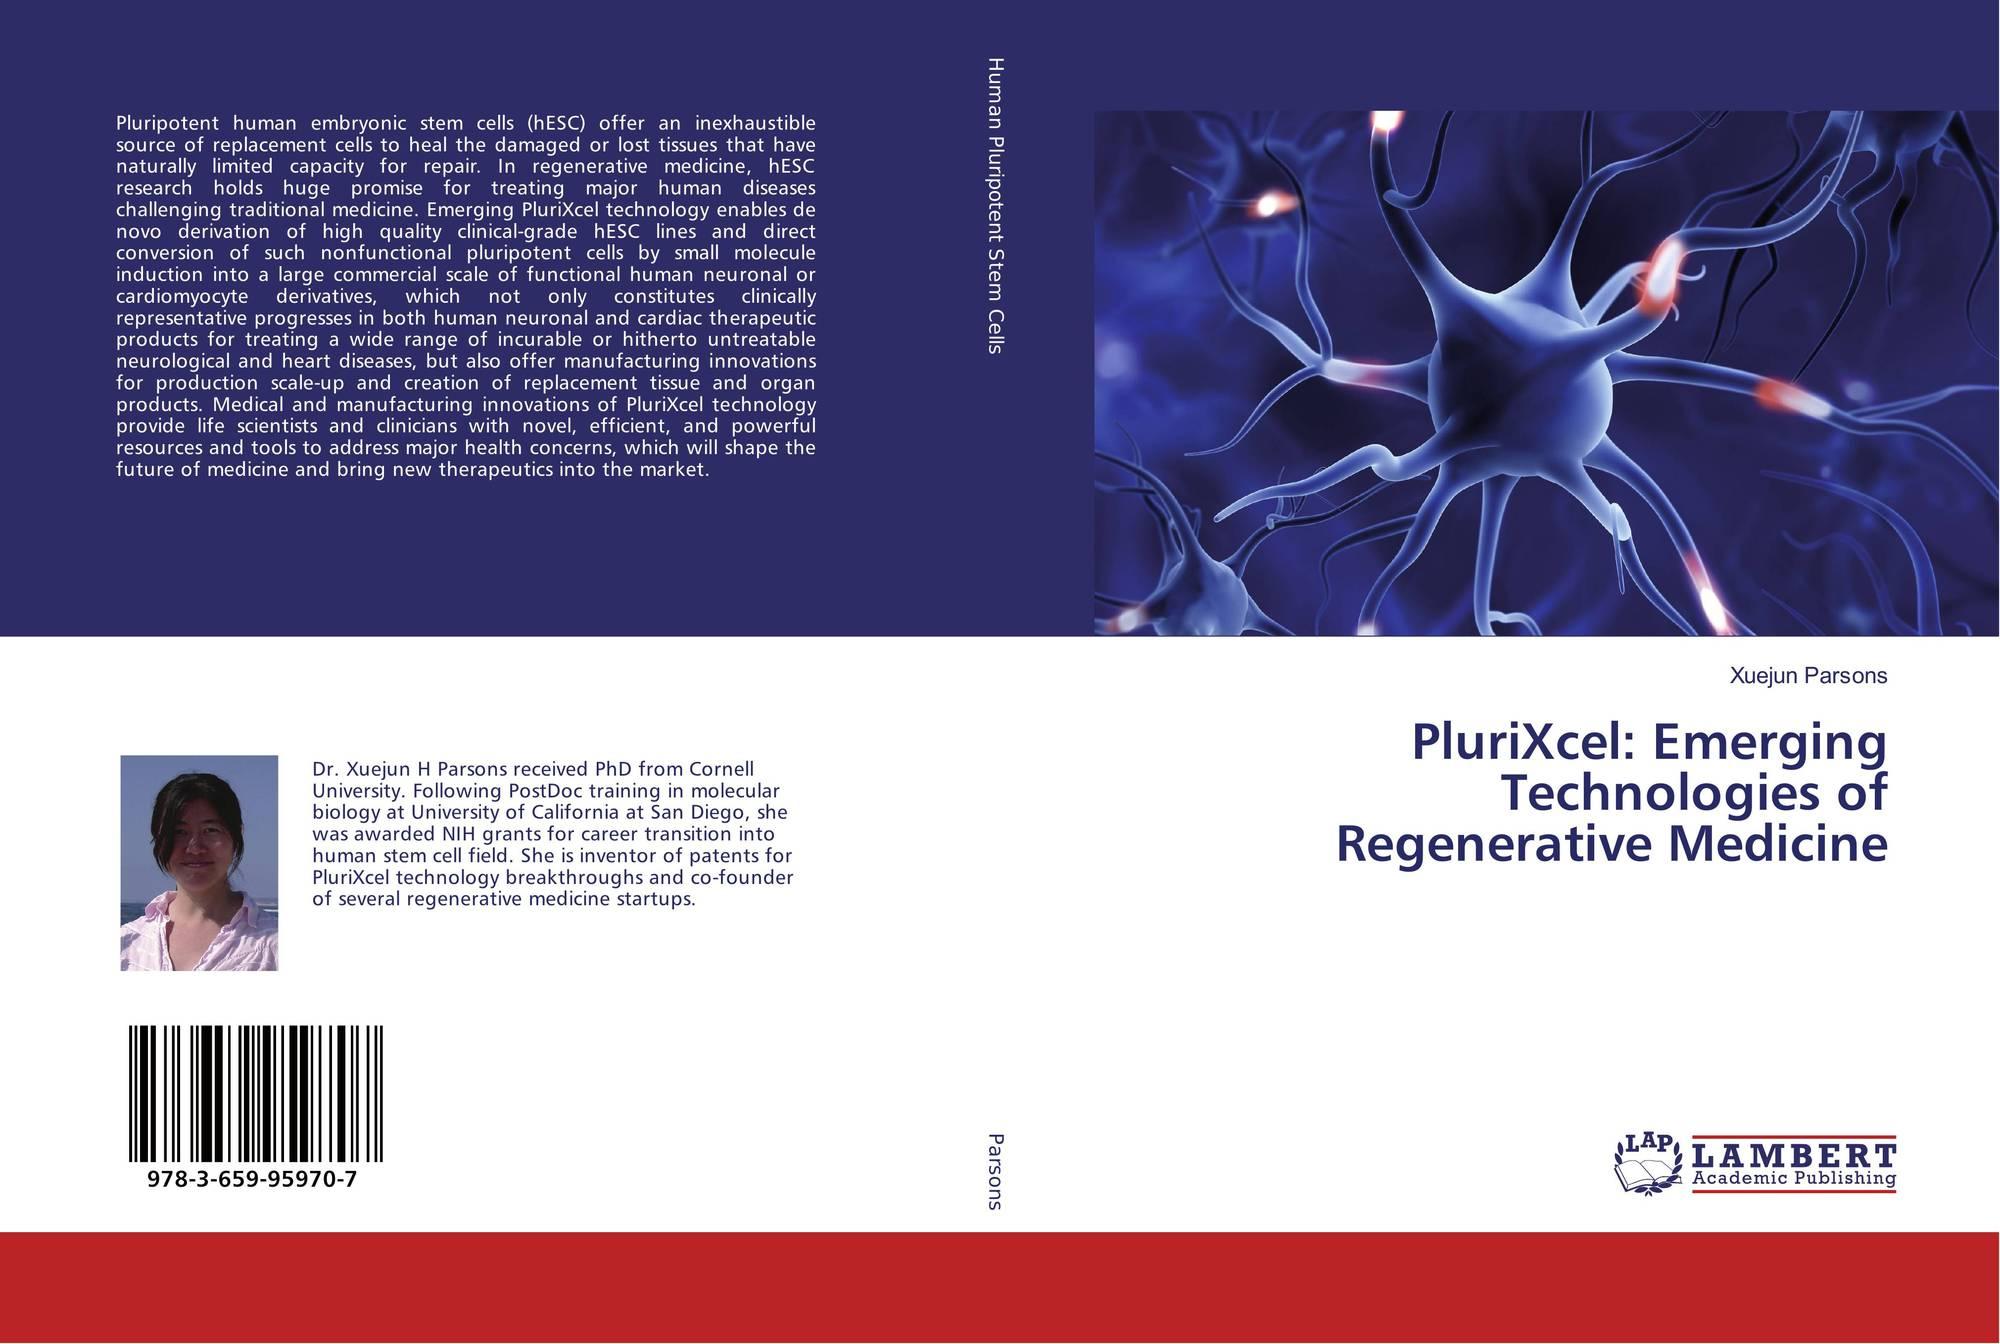 PluriXcel: Emerging Technologies of Regenerative Medicine, 978-3-659